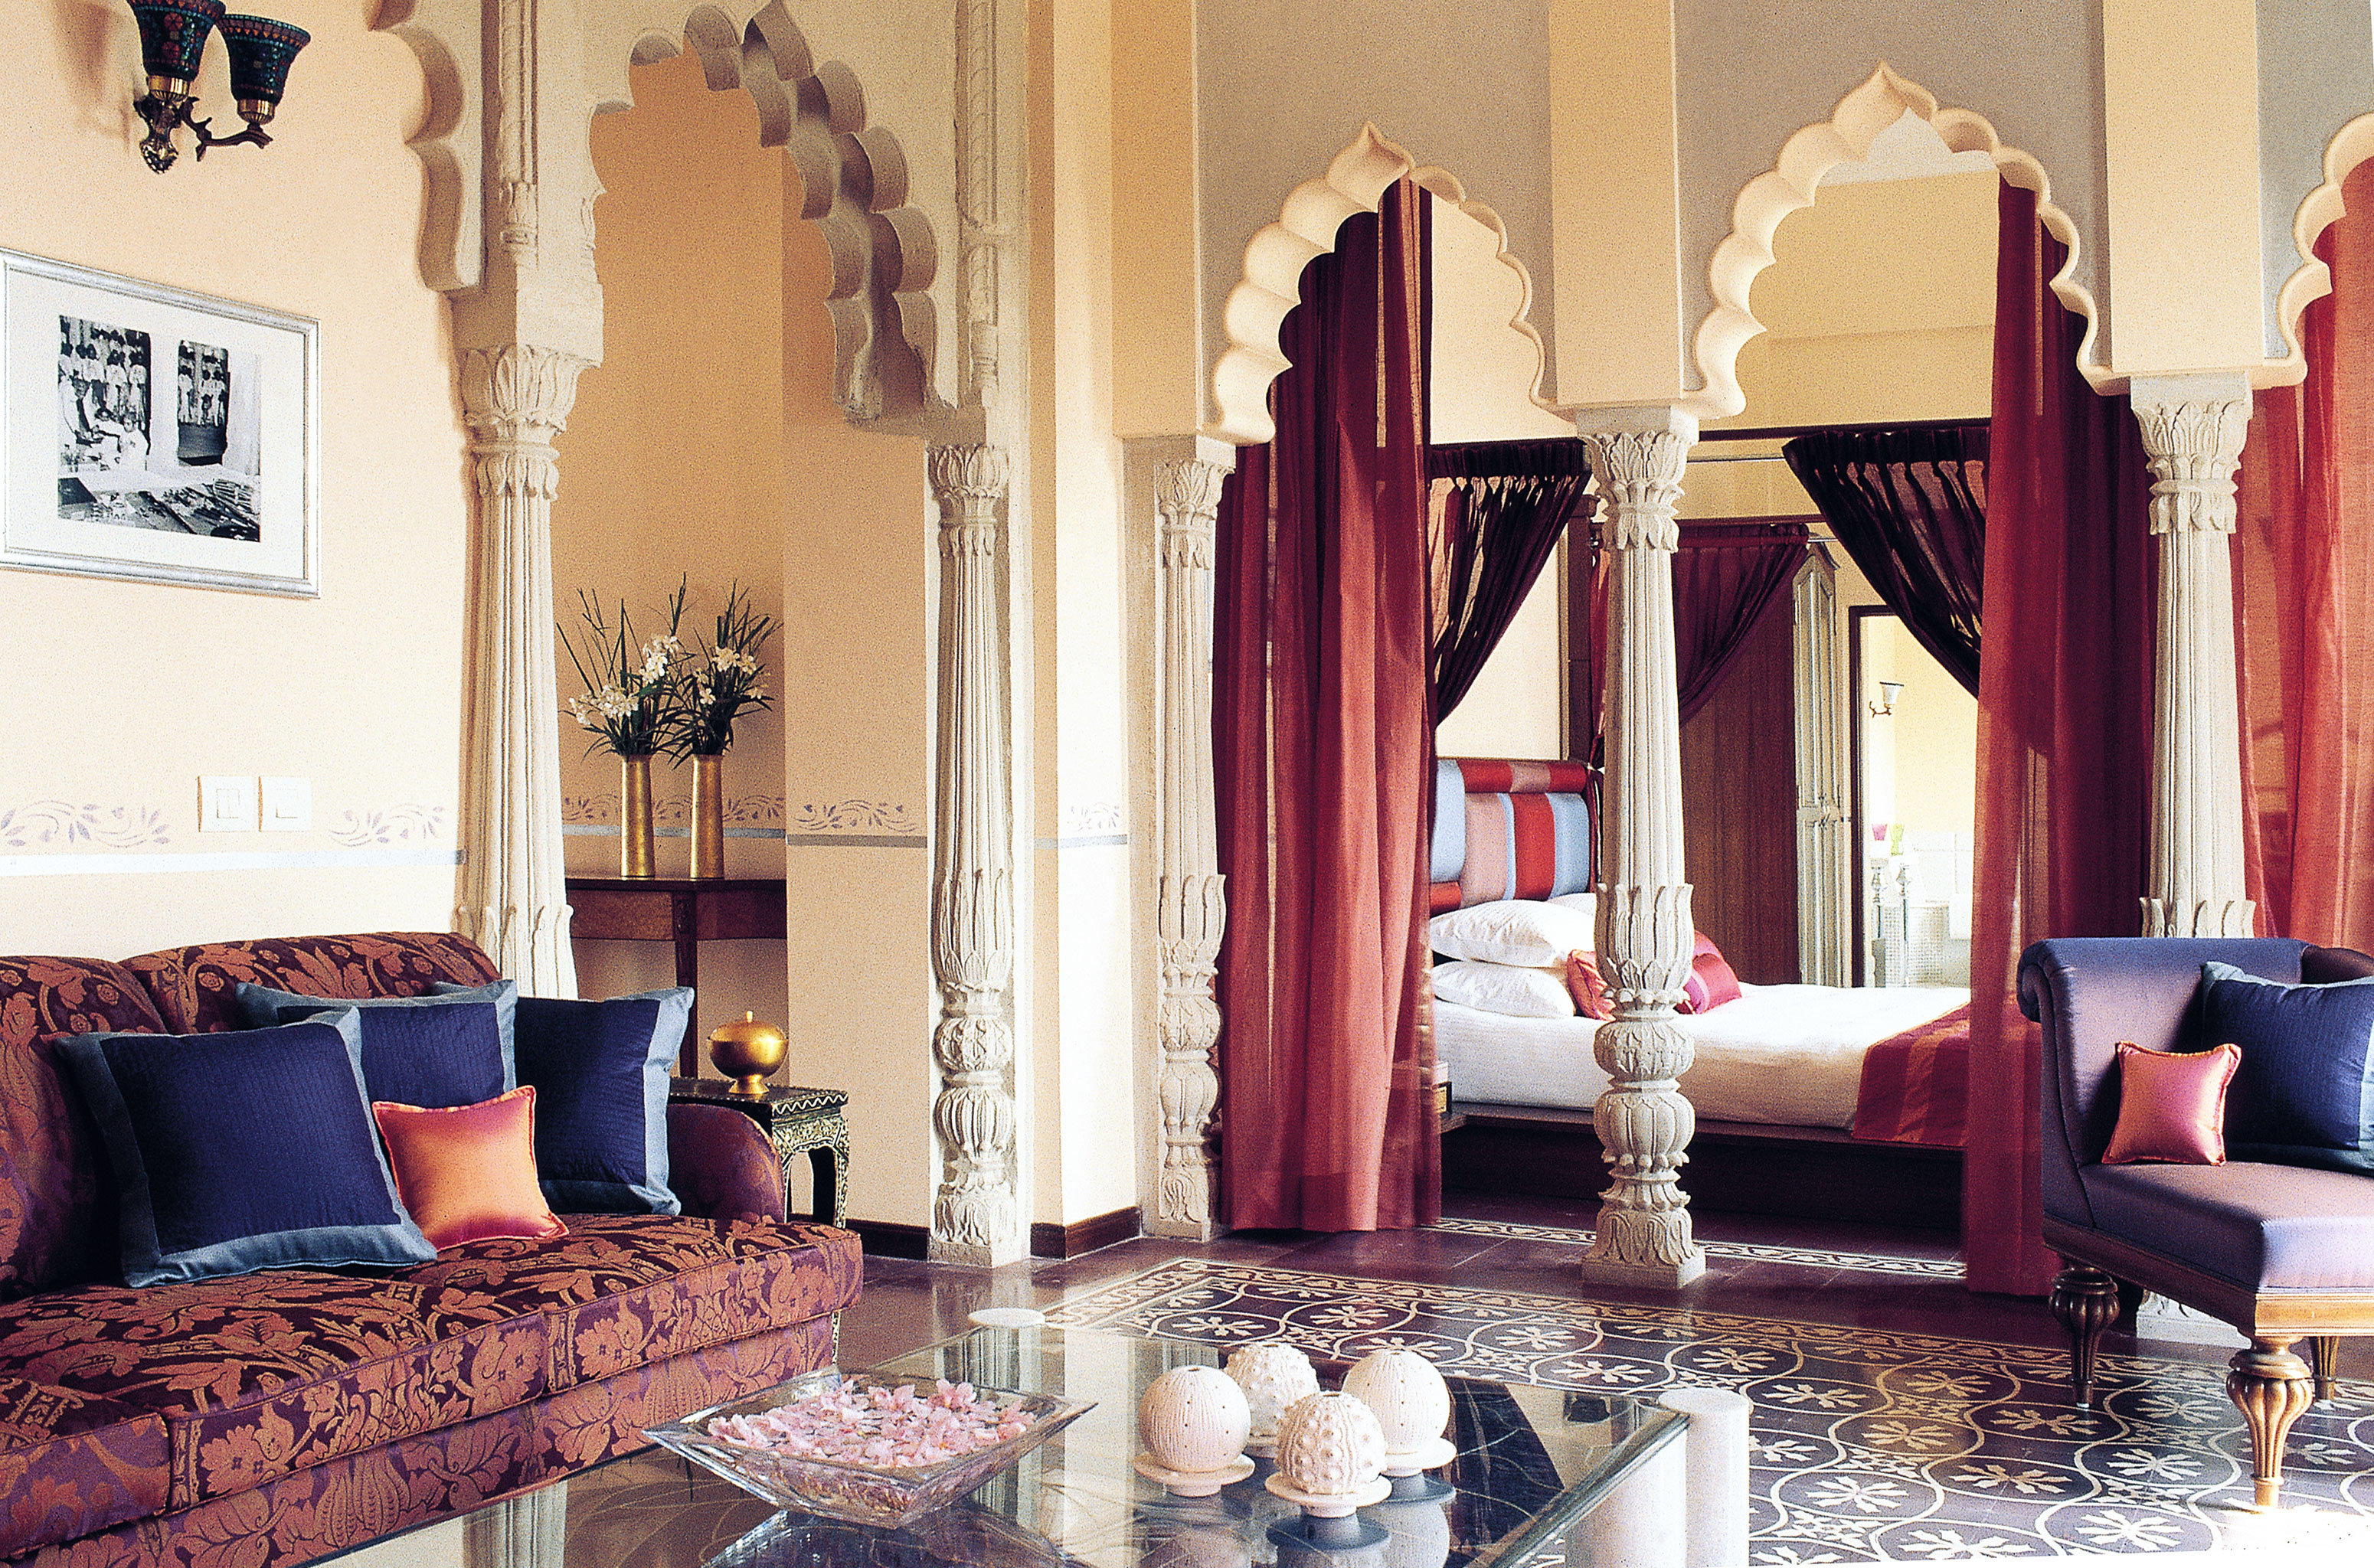 Architecture Cultural Suite living room home curtain textile window treatment mansion